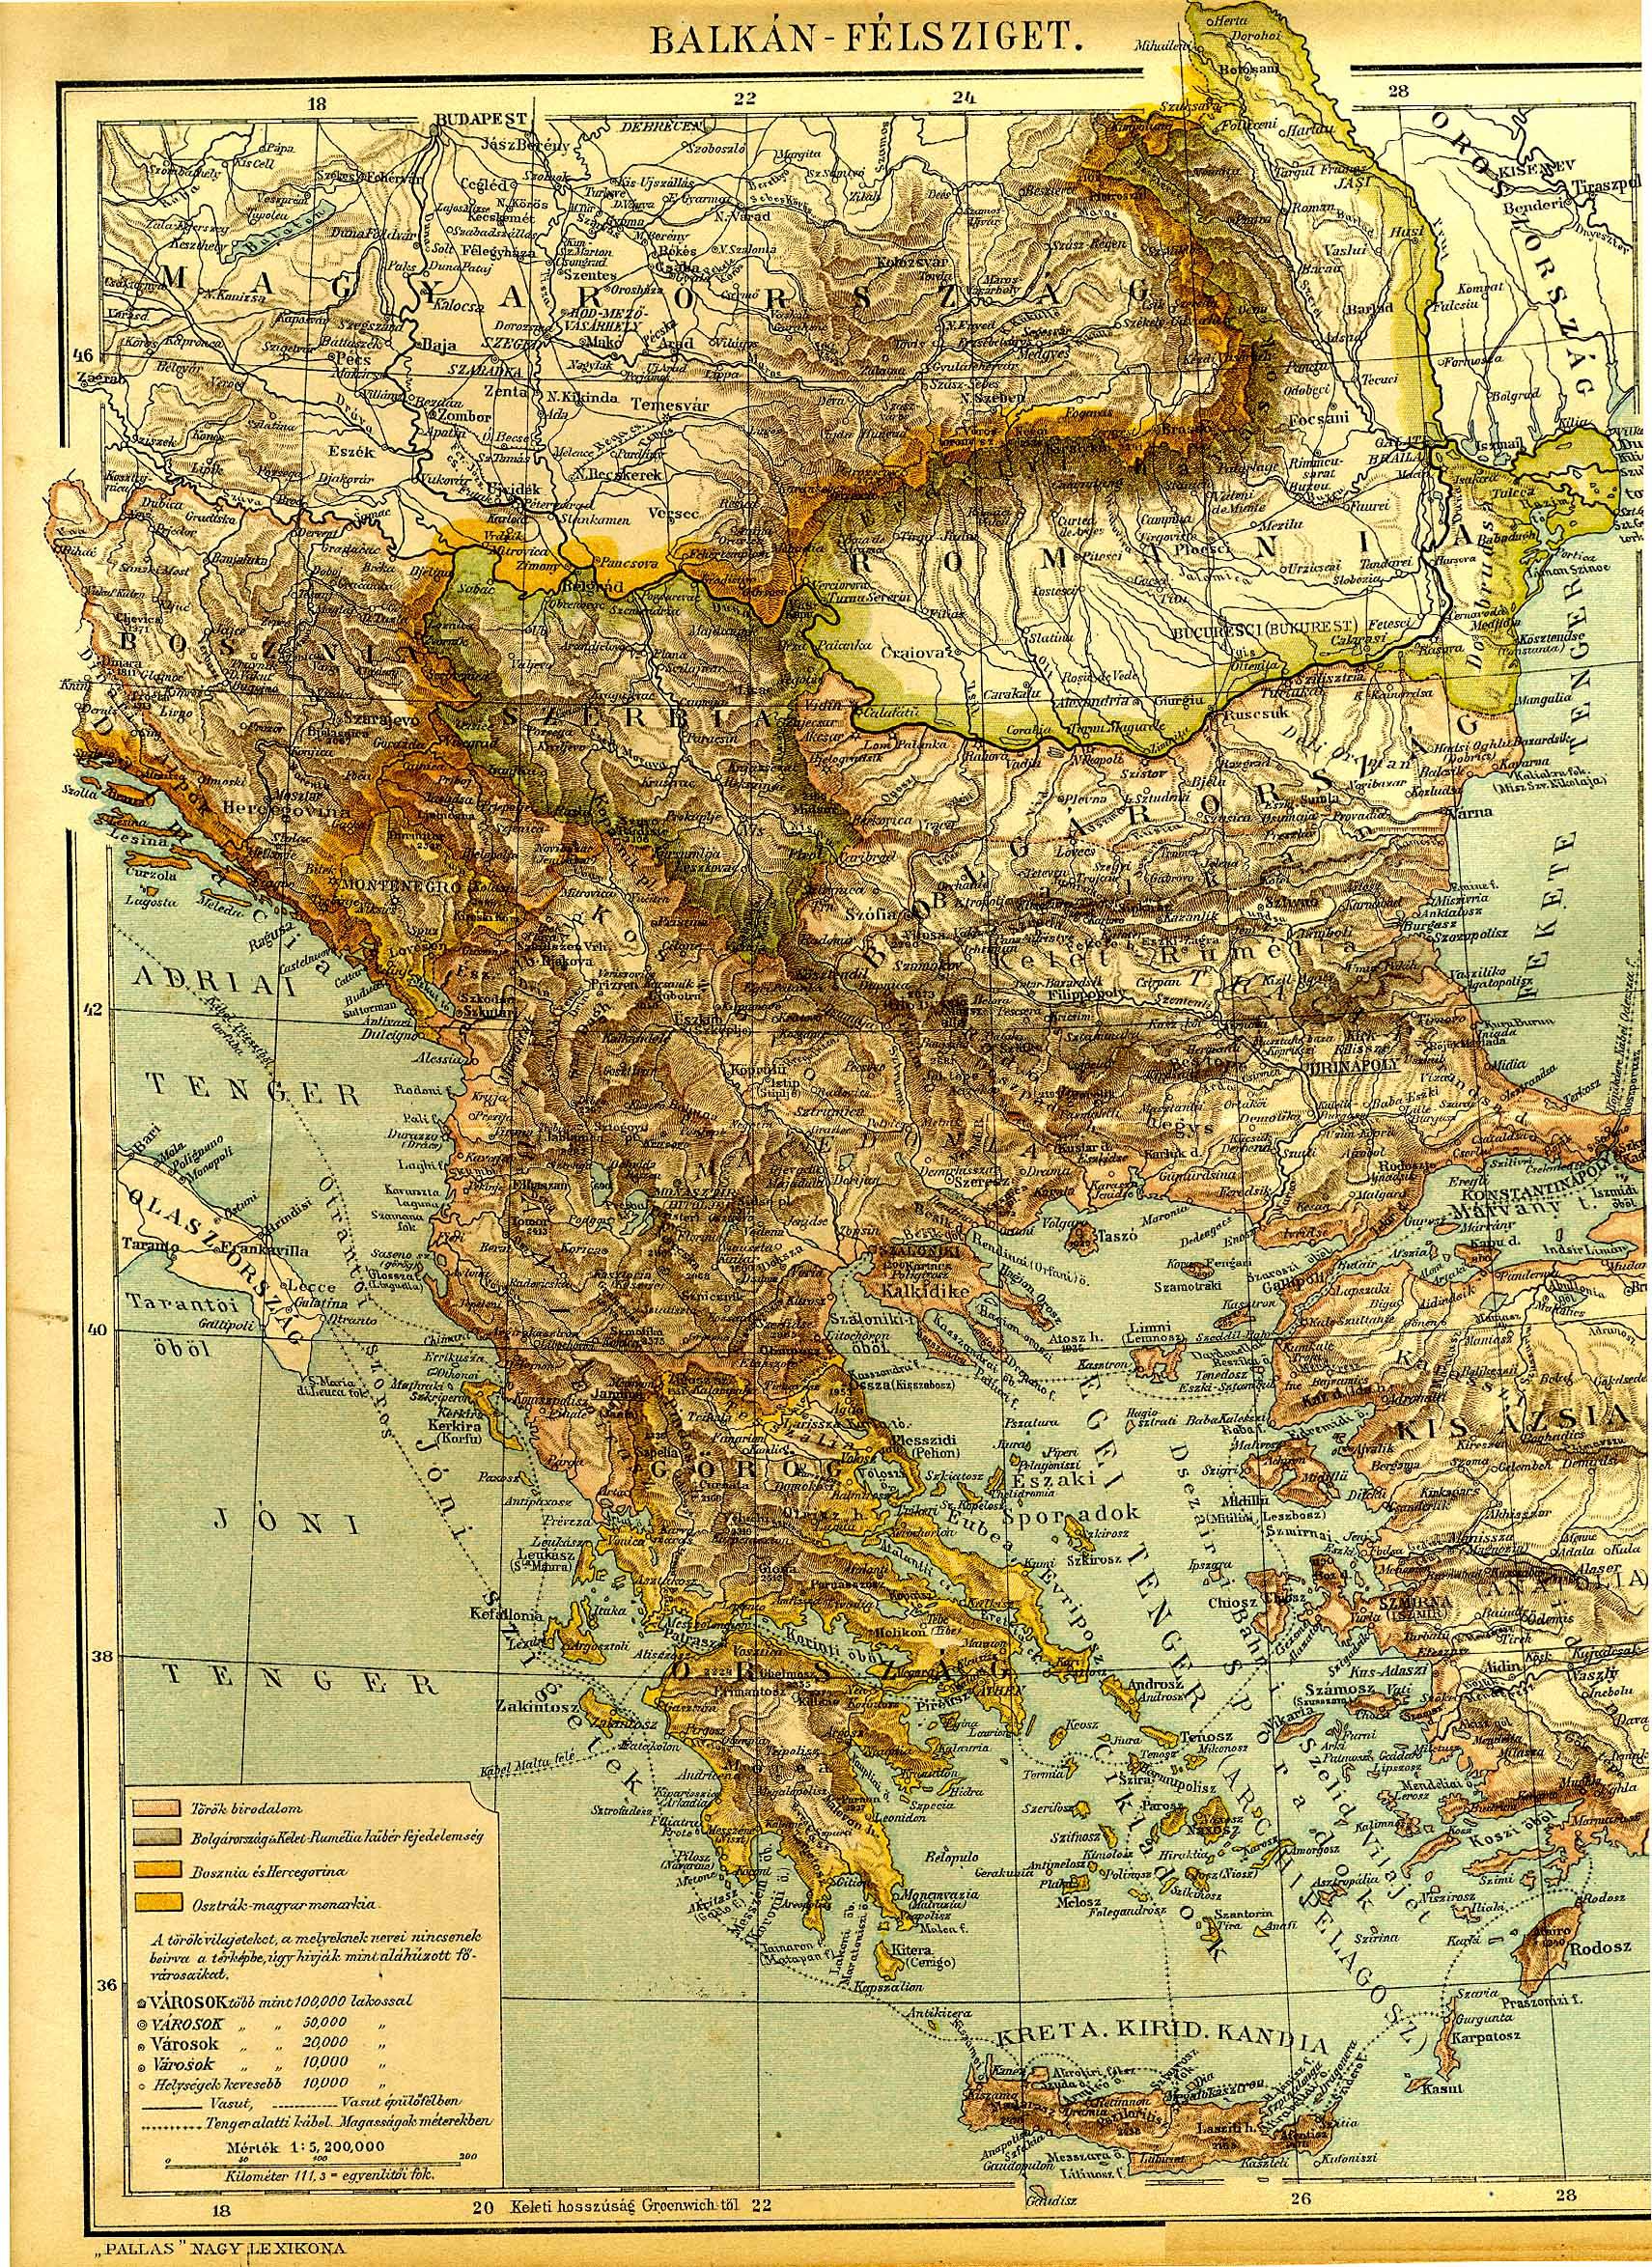 Balkan Felsziget Terkepe Digitalis Keparchivum Dka 000439